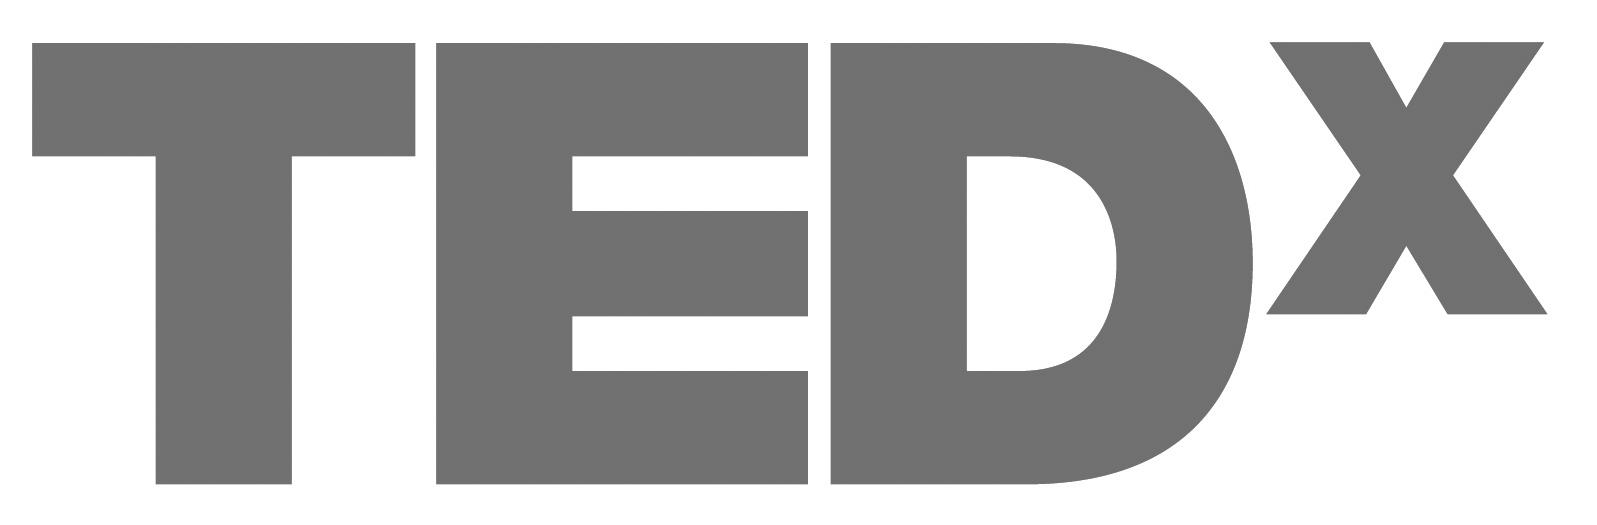 TEDx_logo1b.jpg